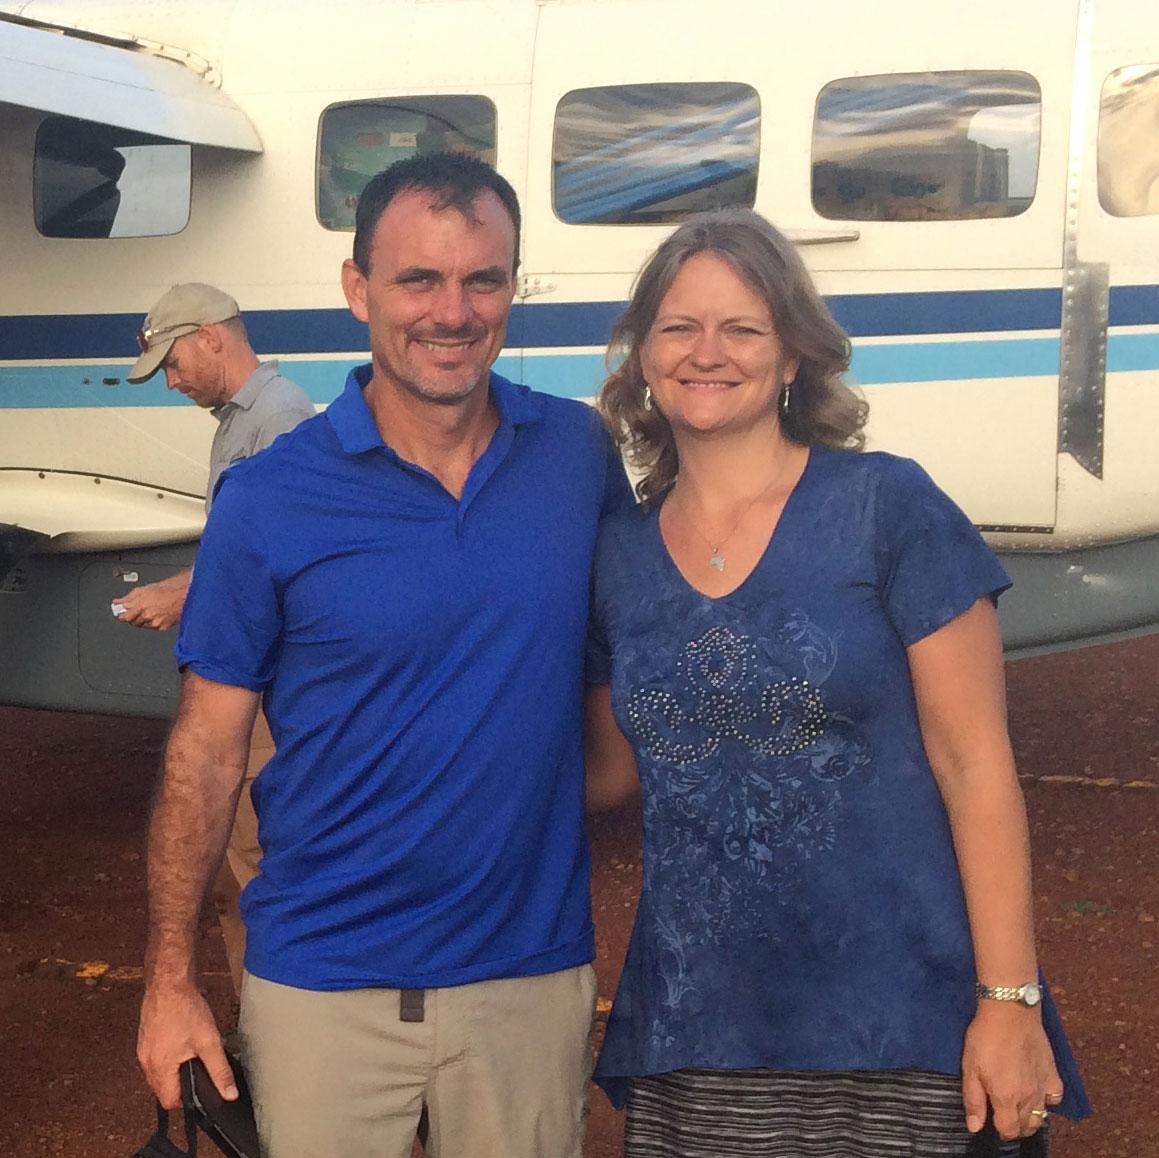 Steve & Sharon Entwistle